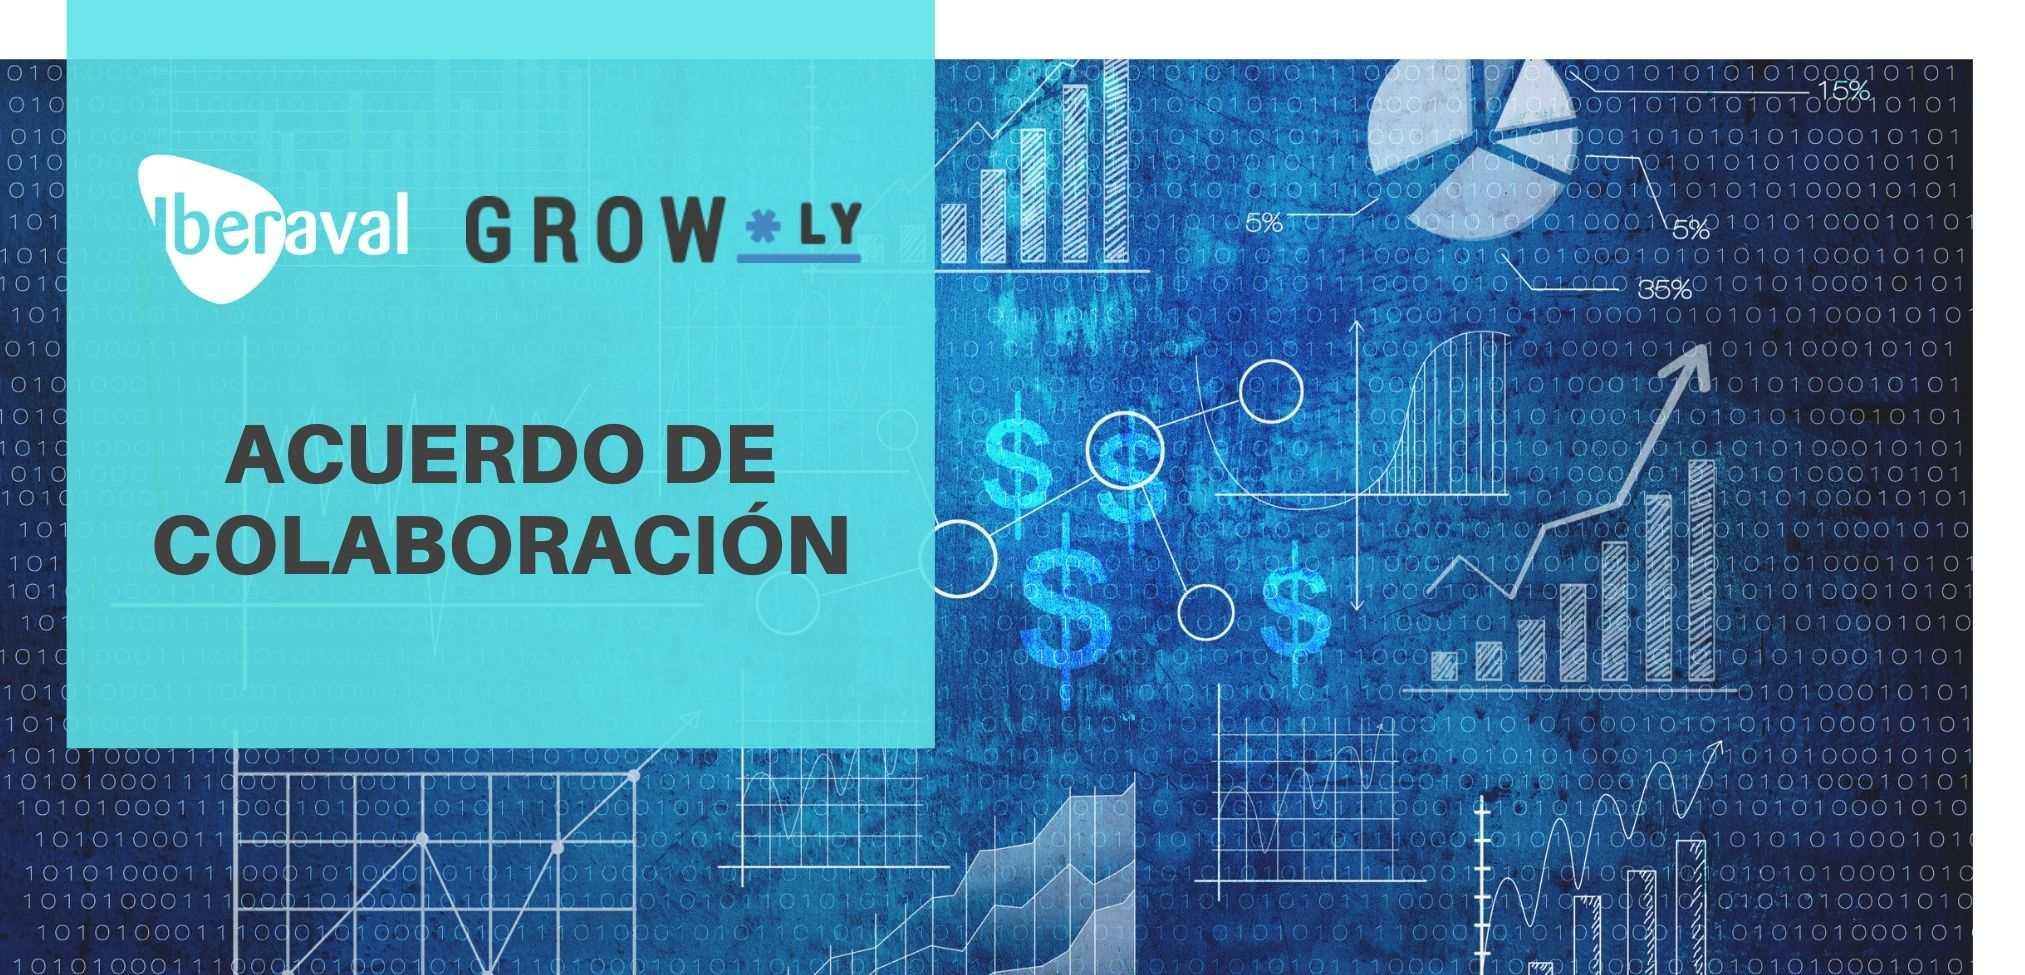 Acuerdo de colaboración con Grow.Ly